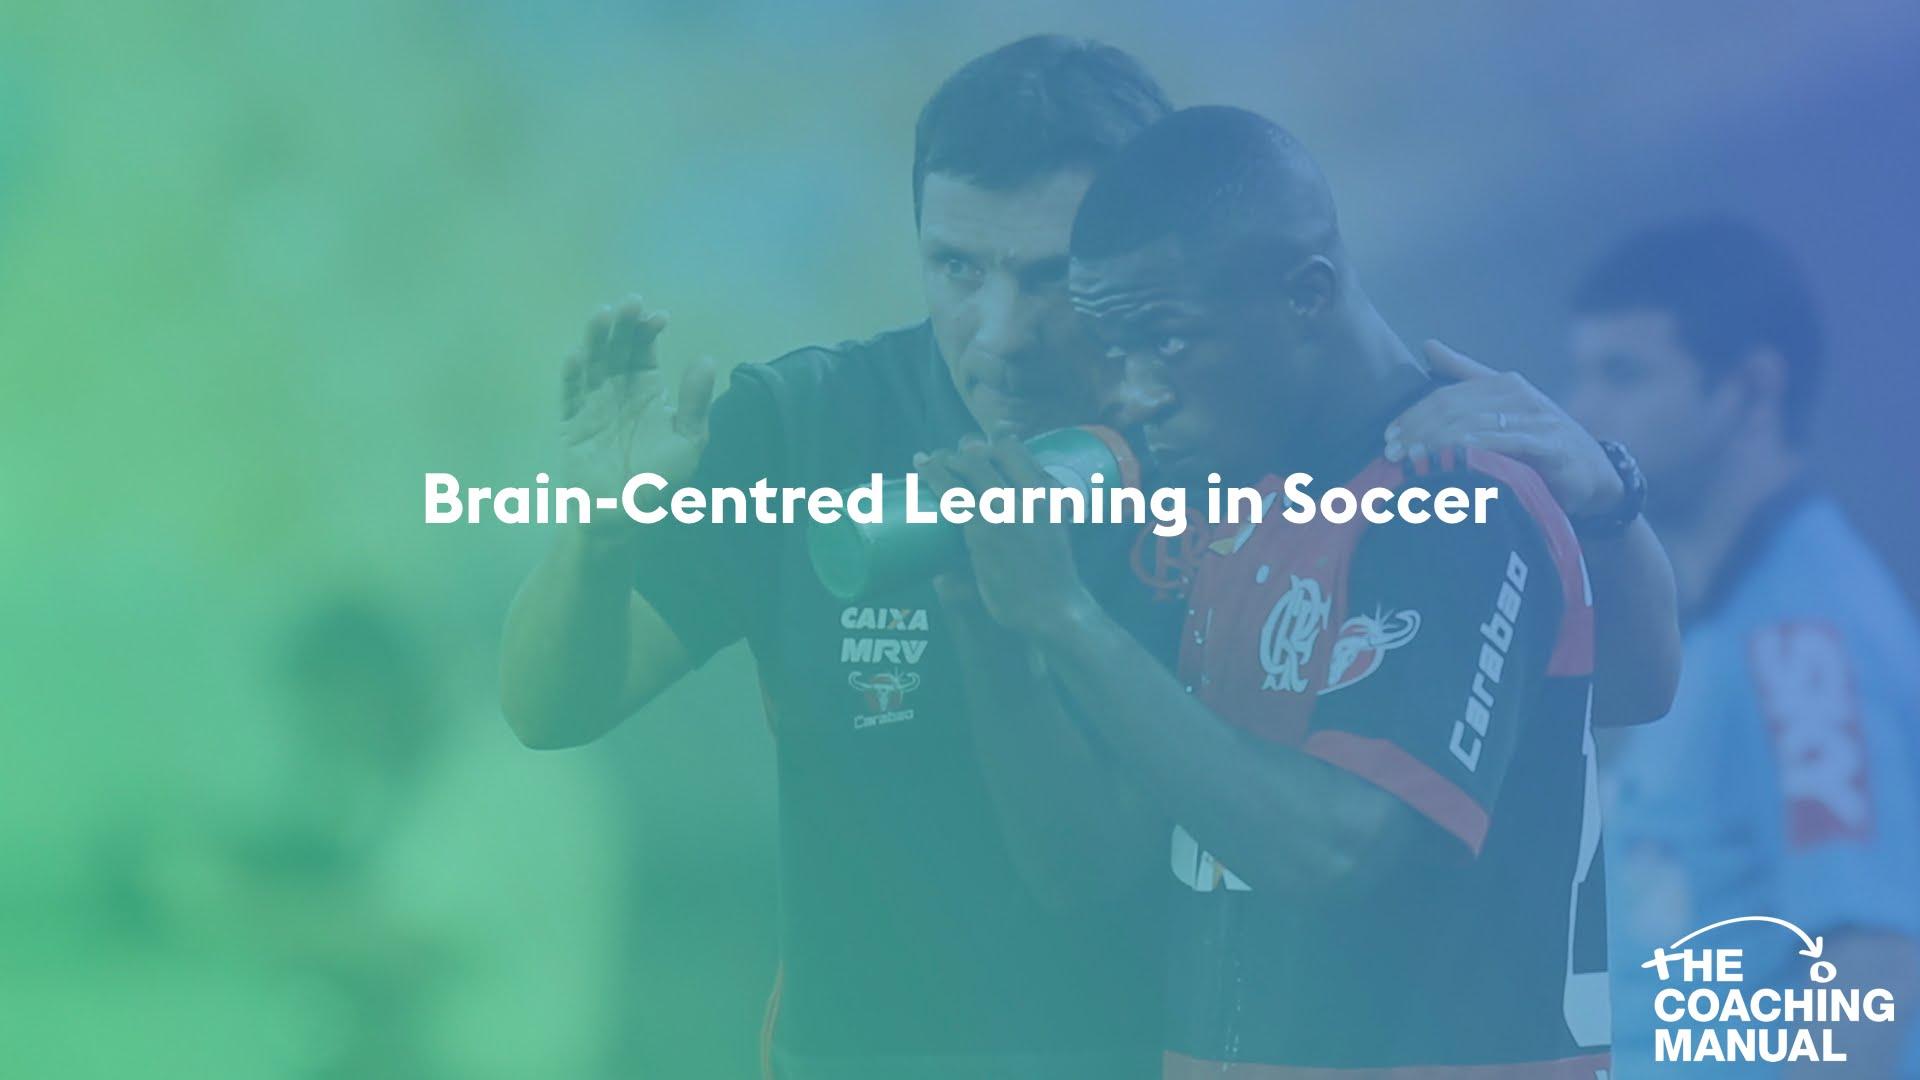 Brain-Centred Learning in Soccer